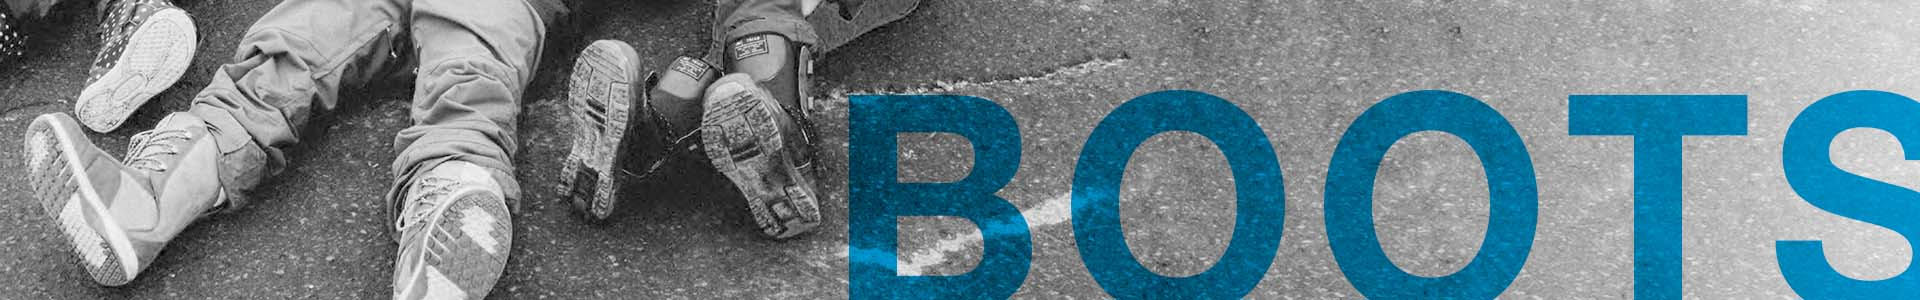 snowboard-boots-1920x300.jpg